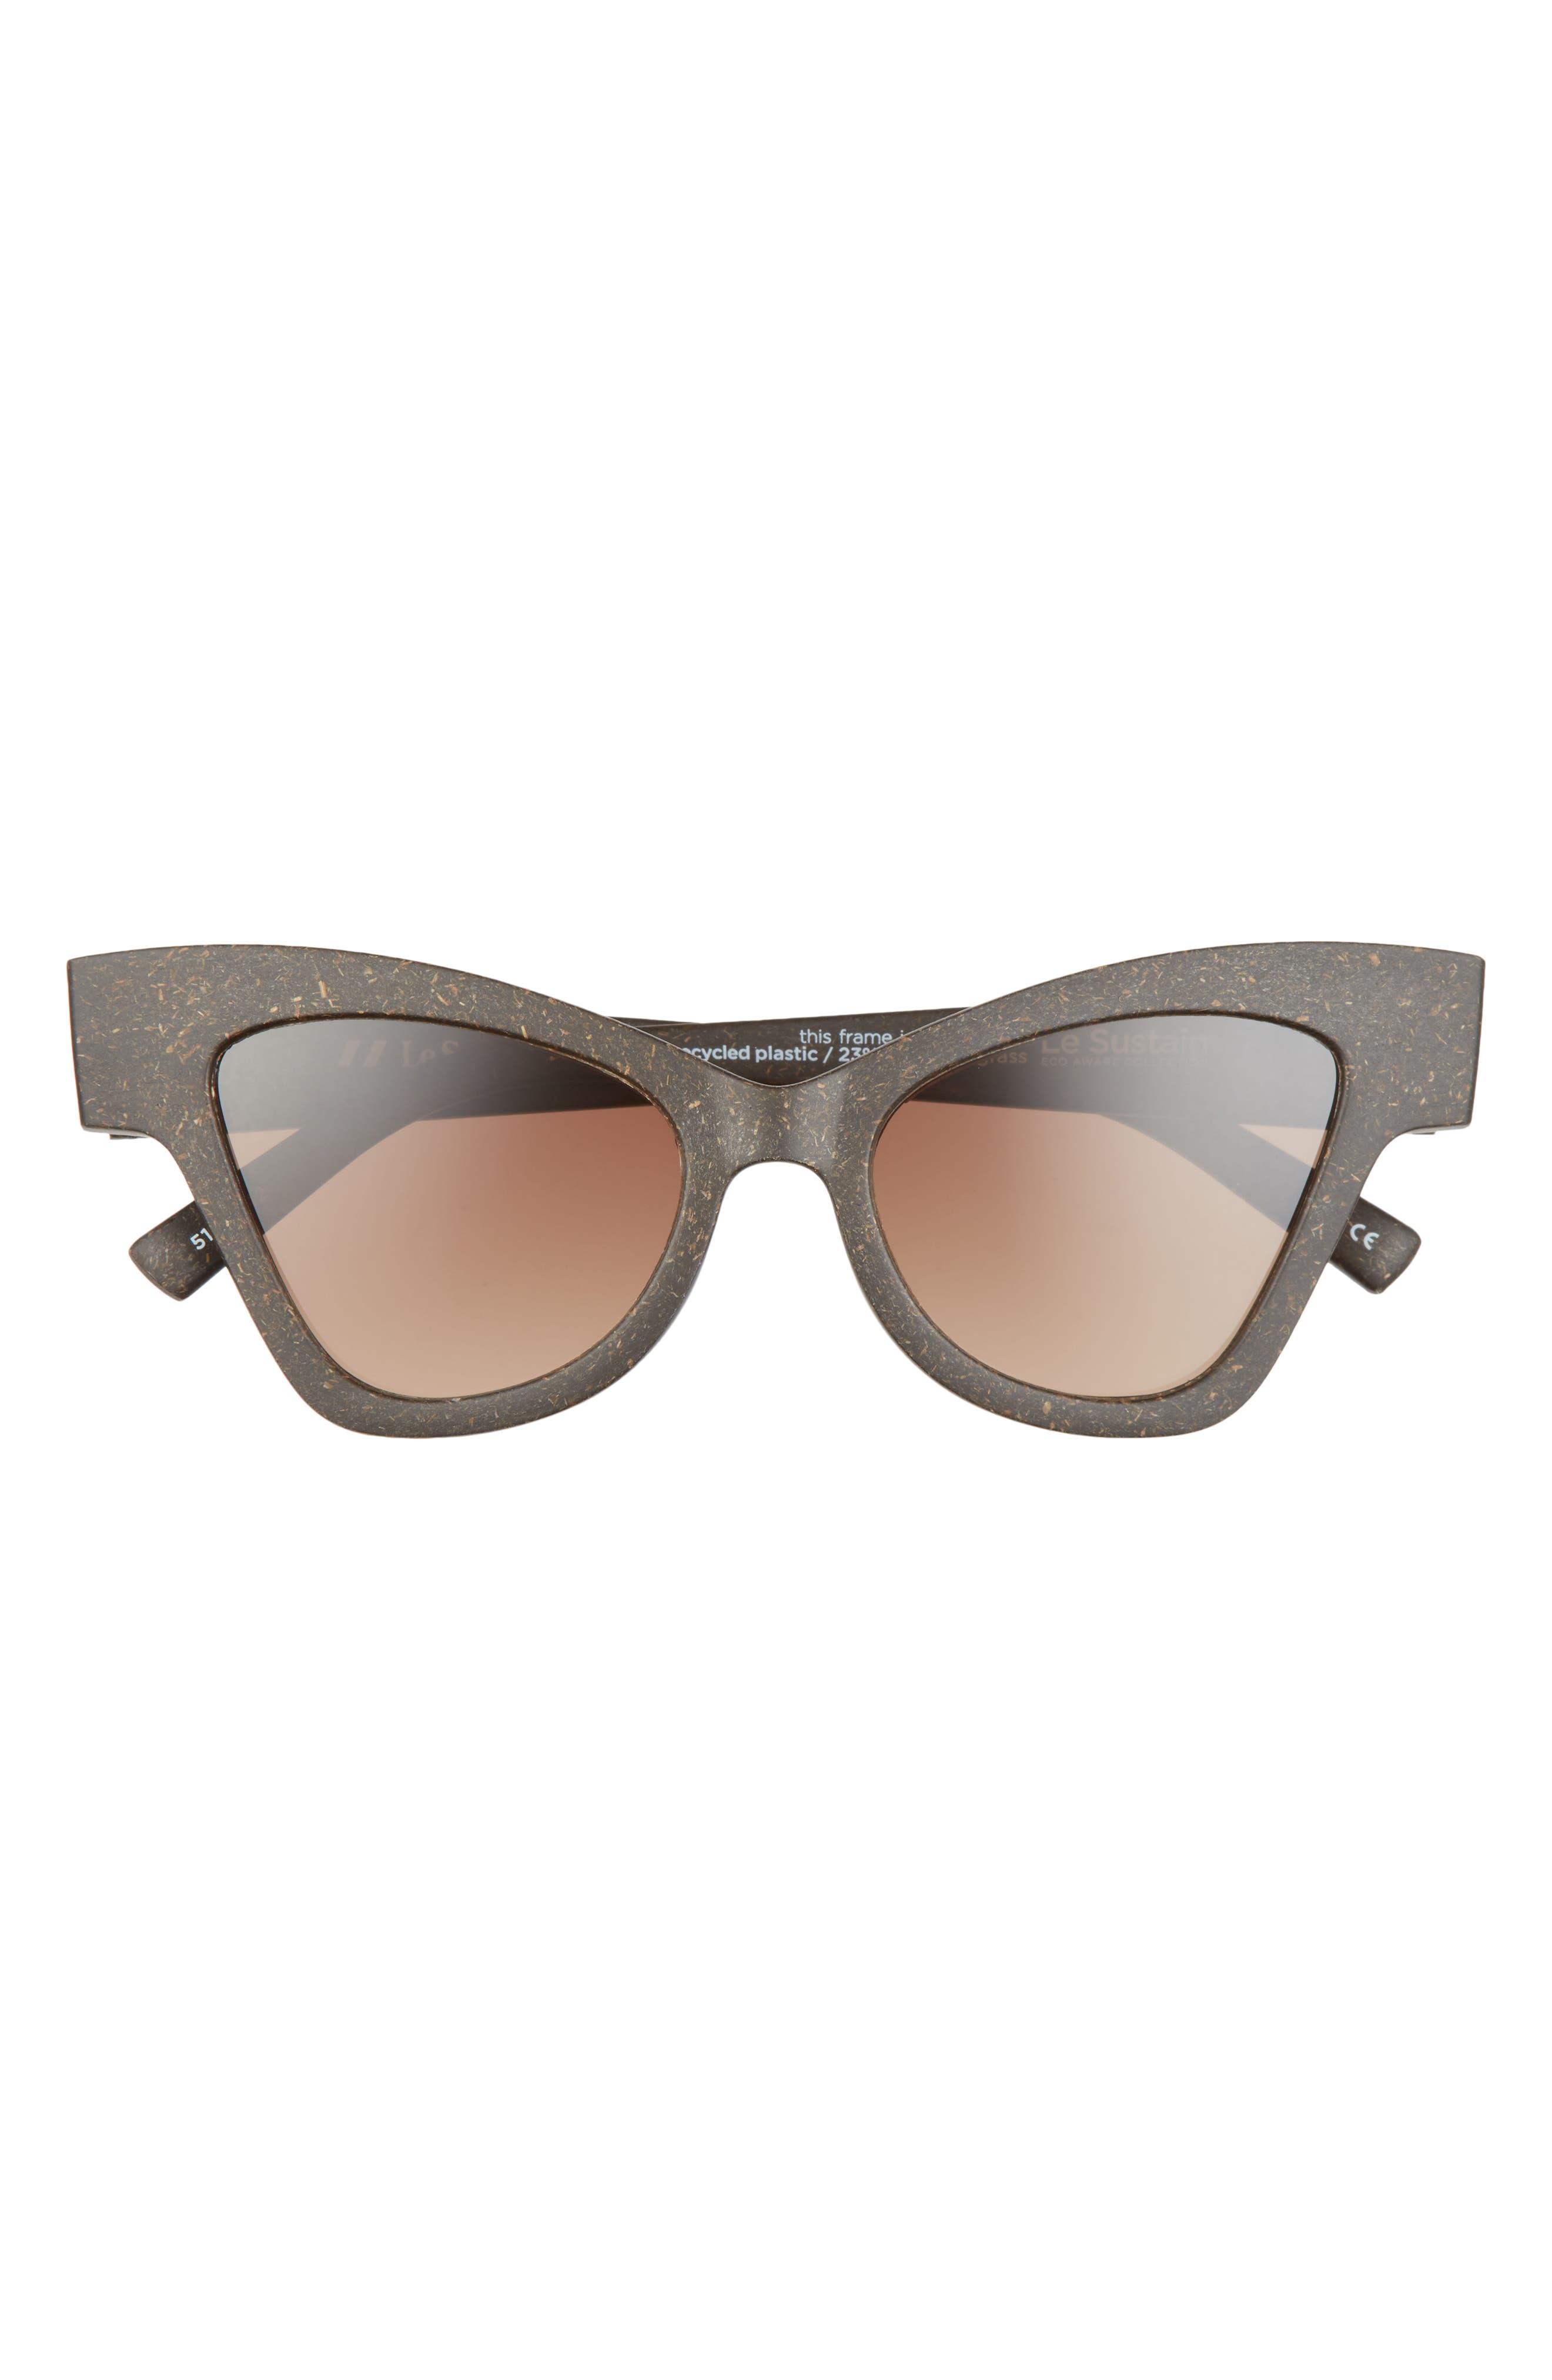 Hourglass 51mm Polarized Cat Eye Sunglasses